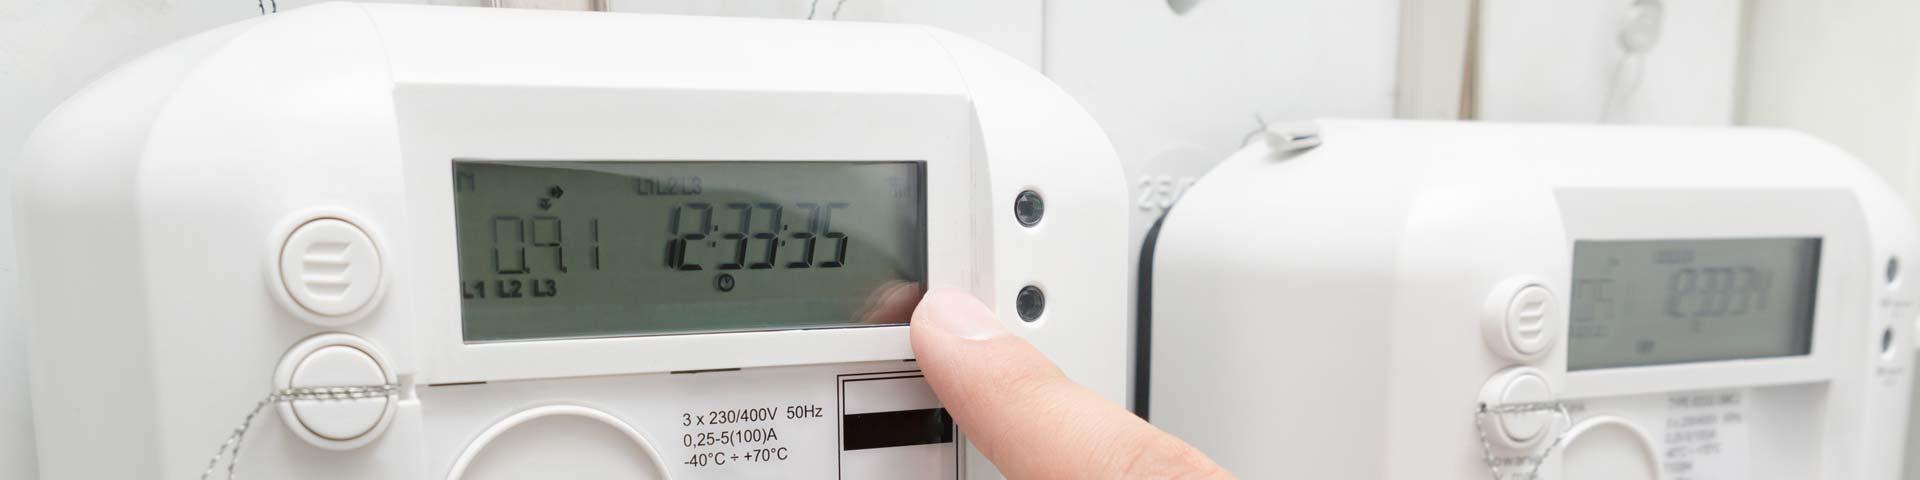 lagere energietarieven variabel